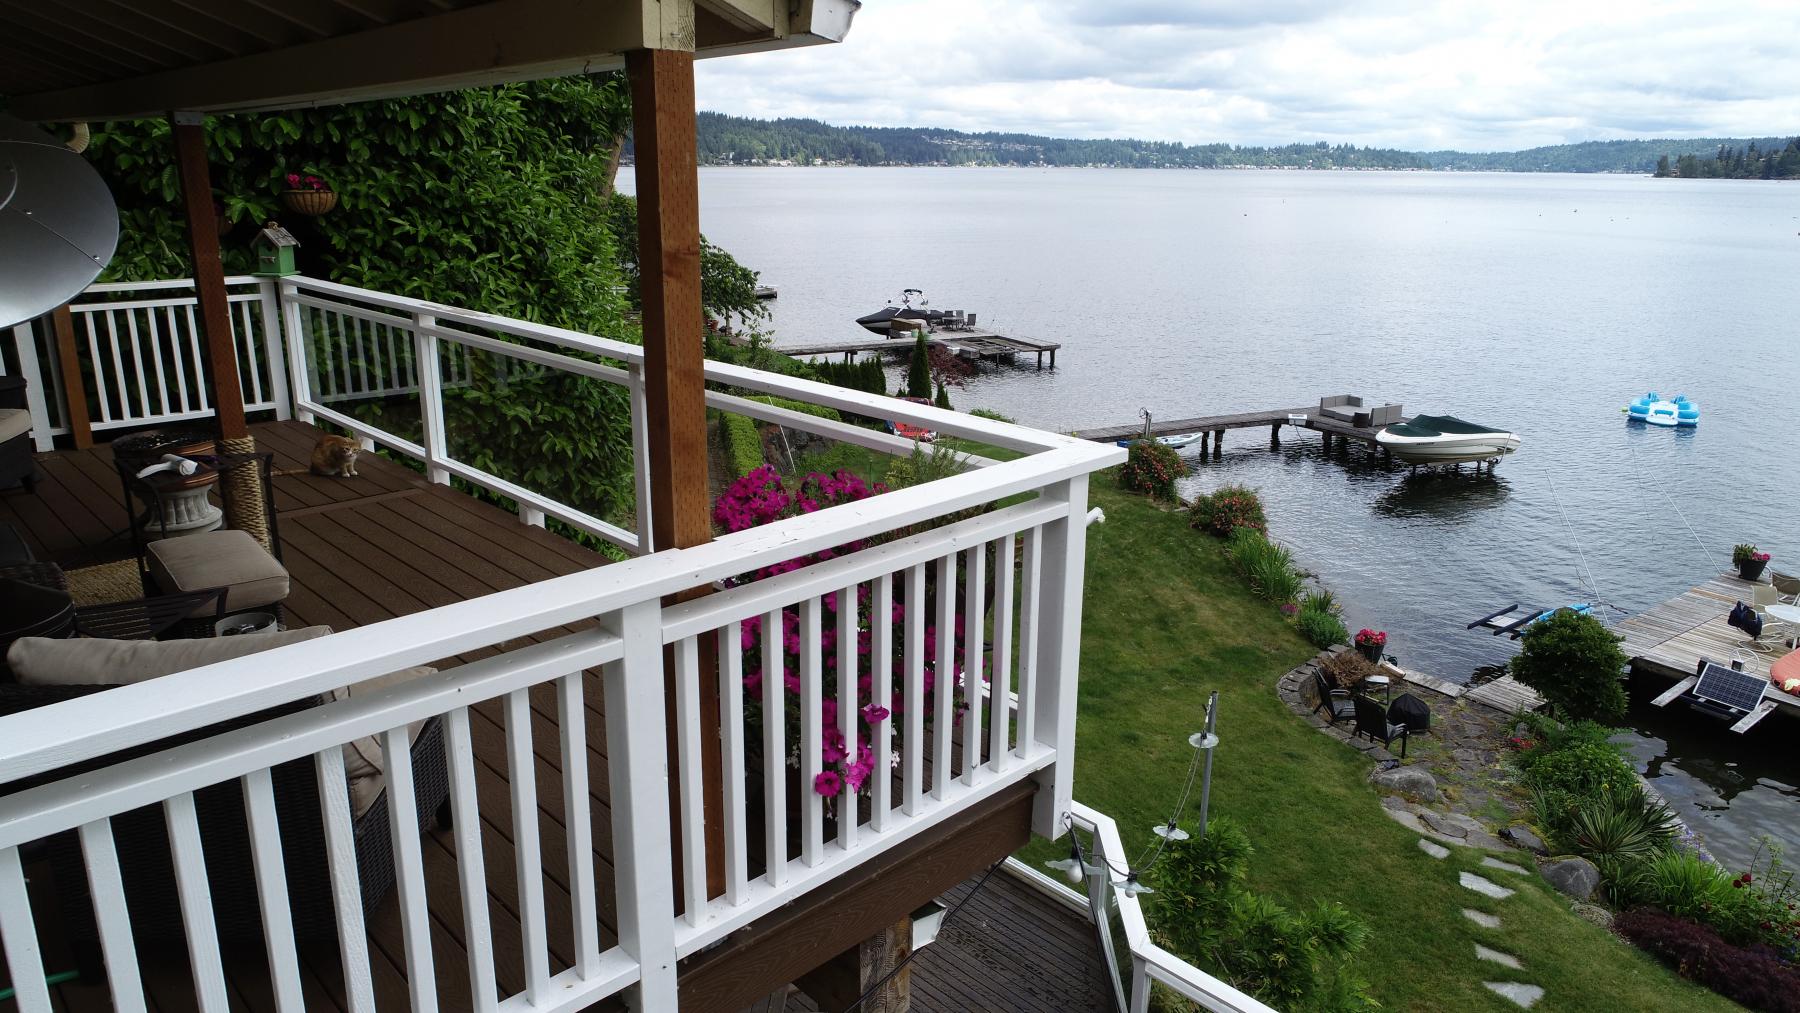 Custom-Decks-relayed-floor-Trex-decking-woodland-brown-lake-sammamish-washington